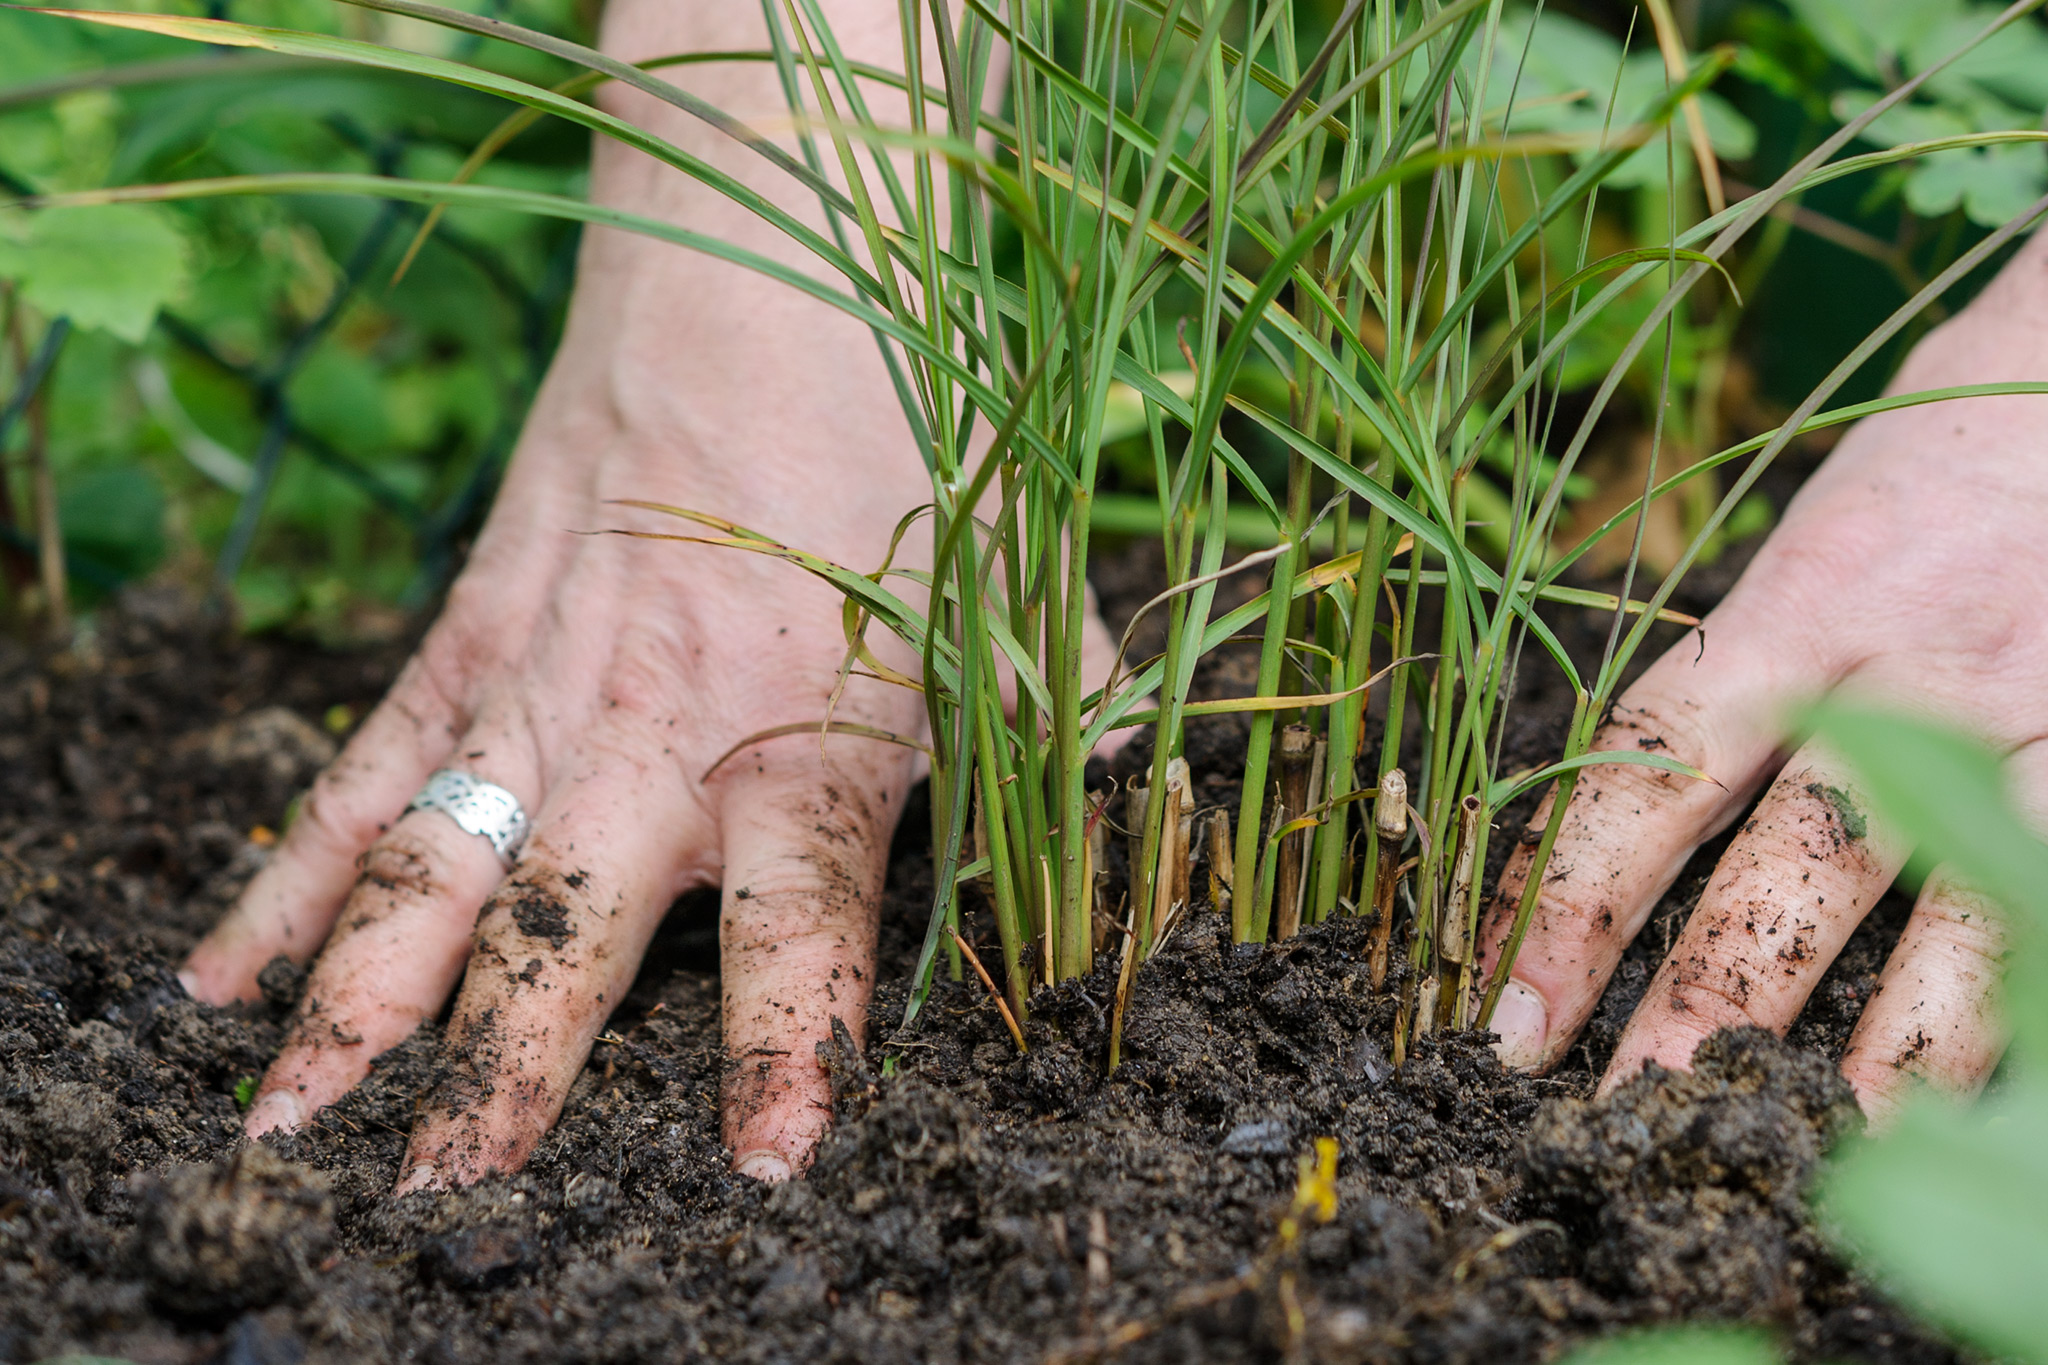 planting-an-ornamental-grass-3